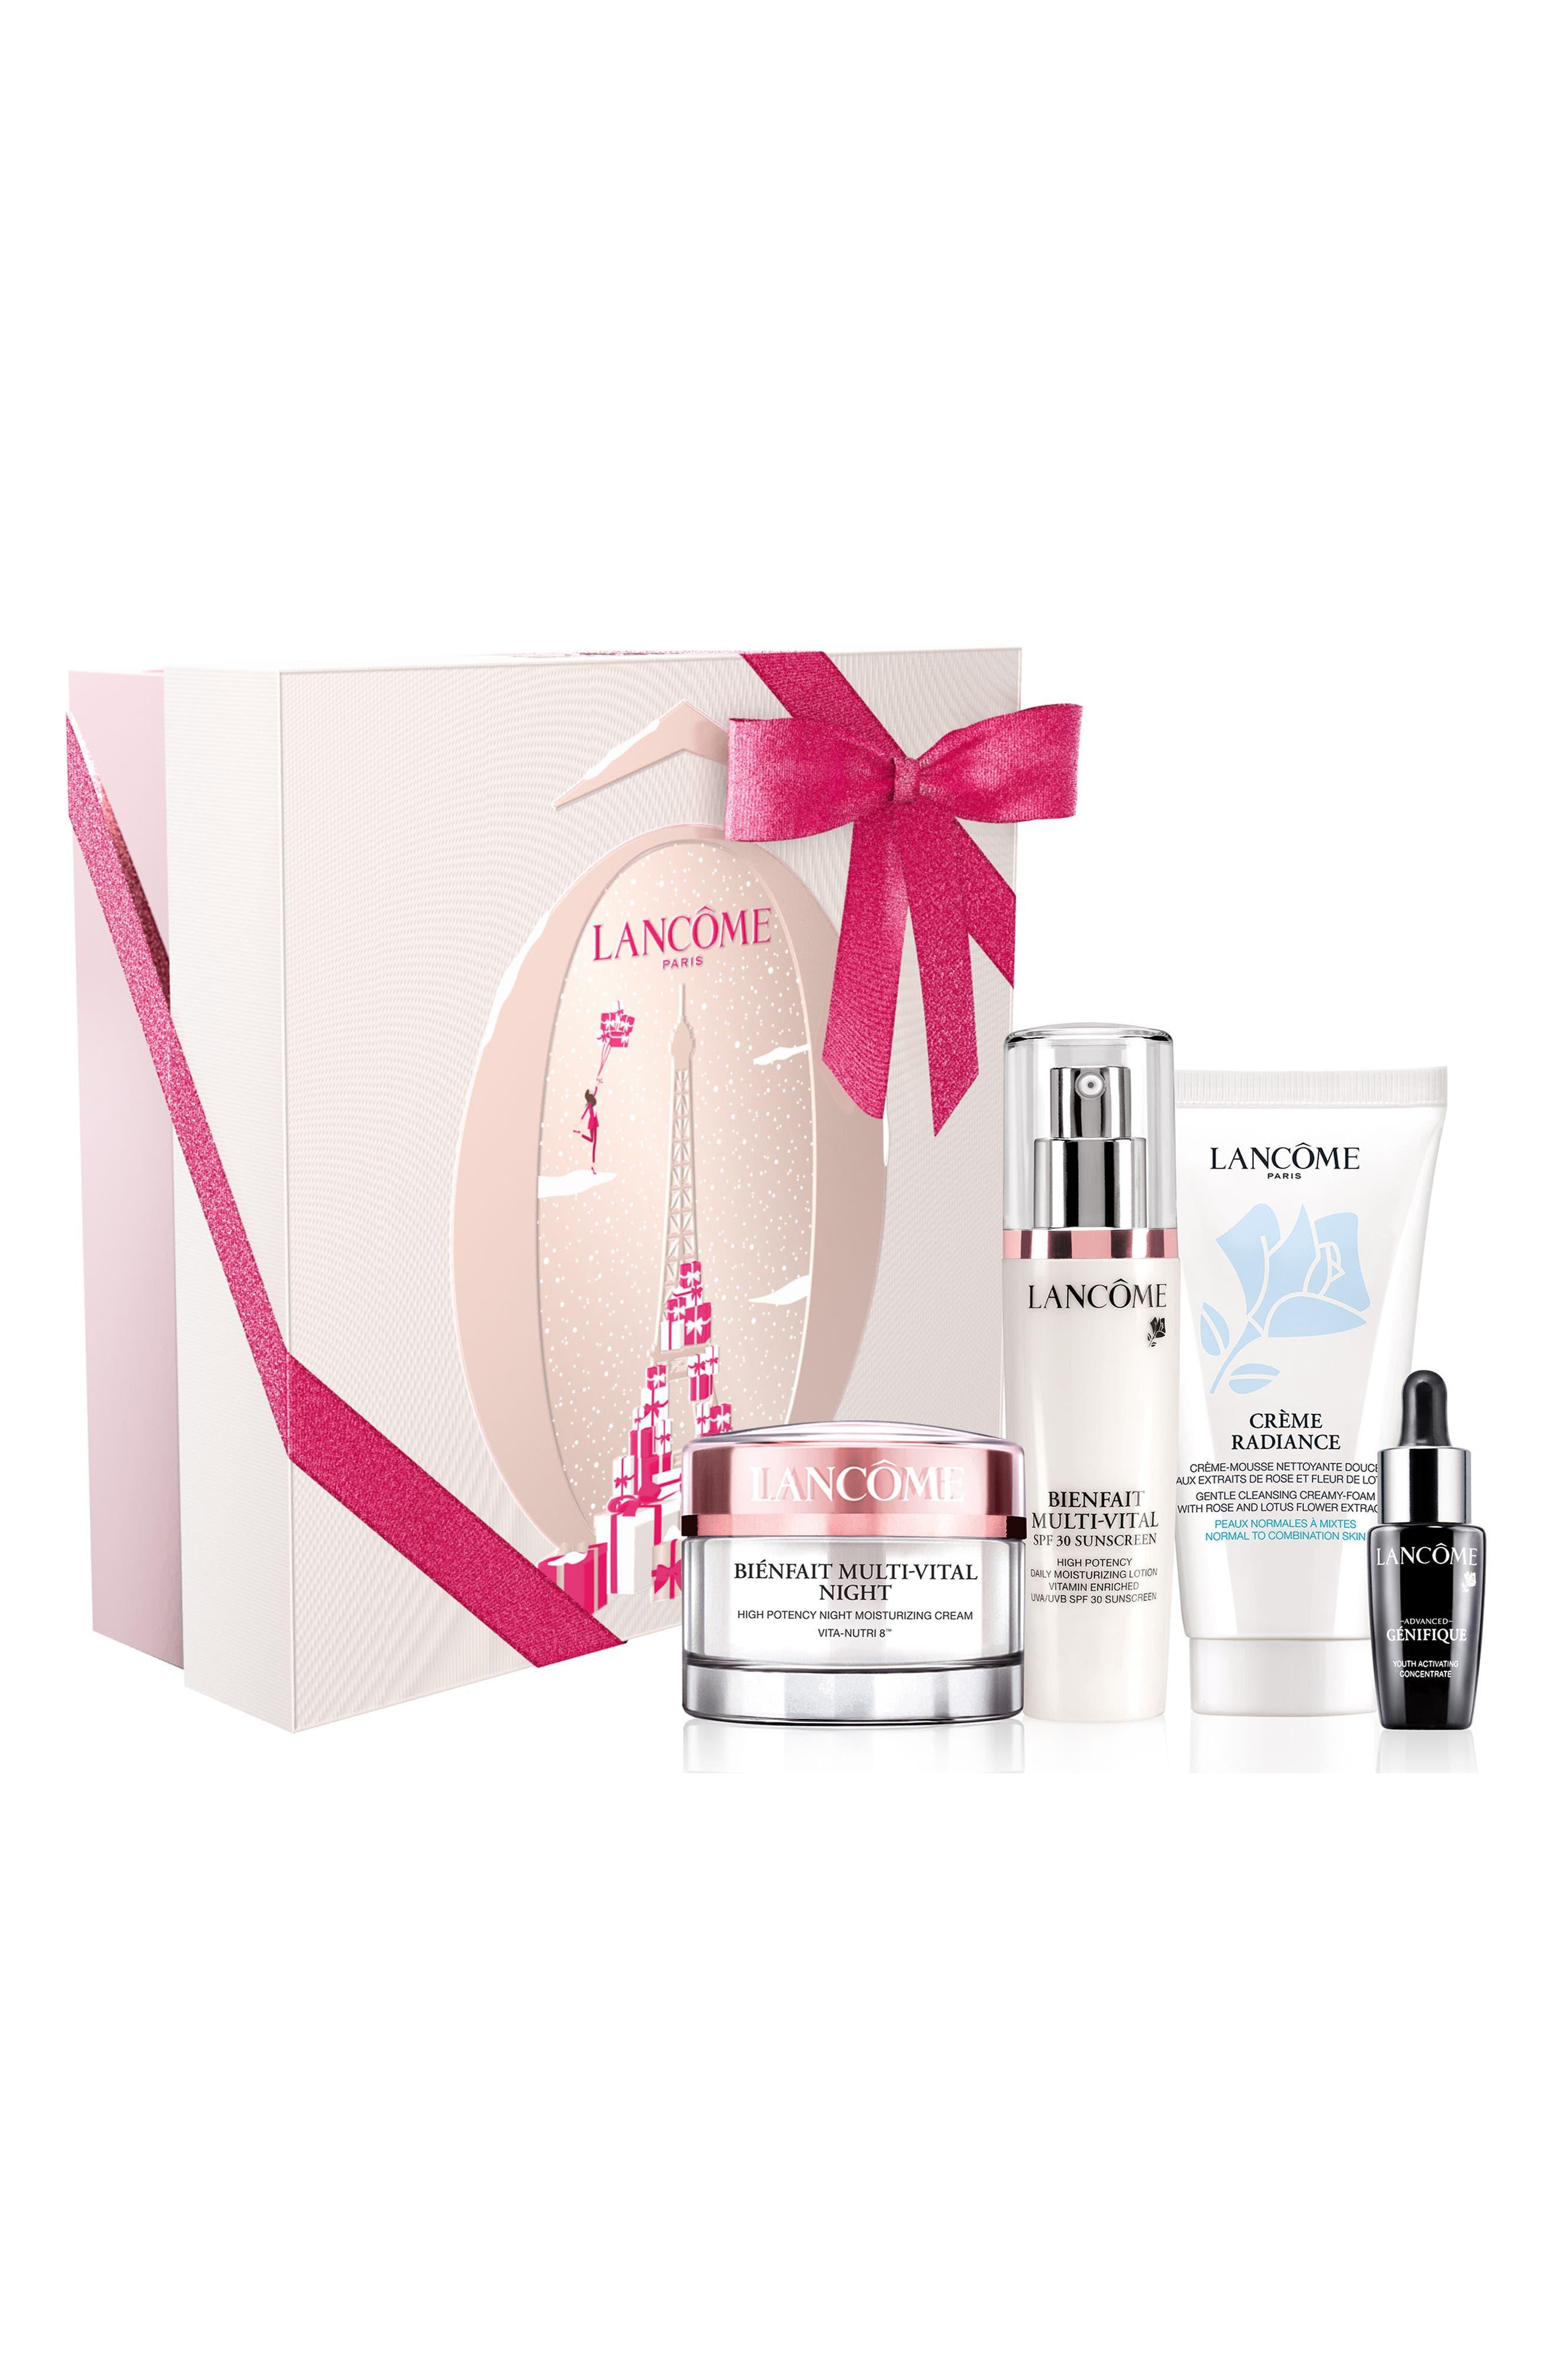 Lancôme Bienfait Multi-Vital Collection for Normal/Combination Skin Types ($132.50 Value)